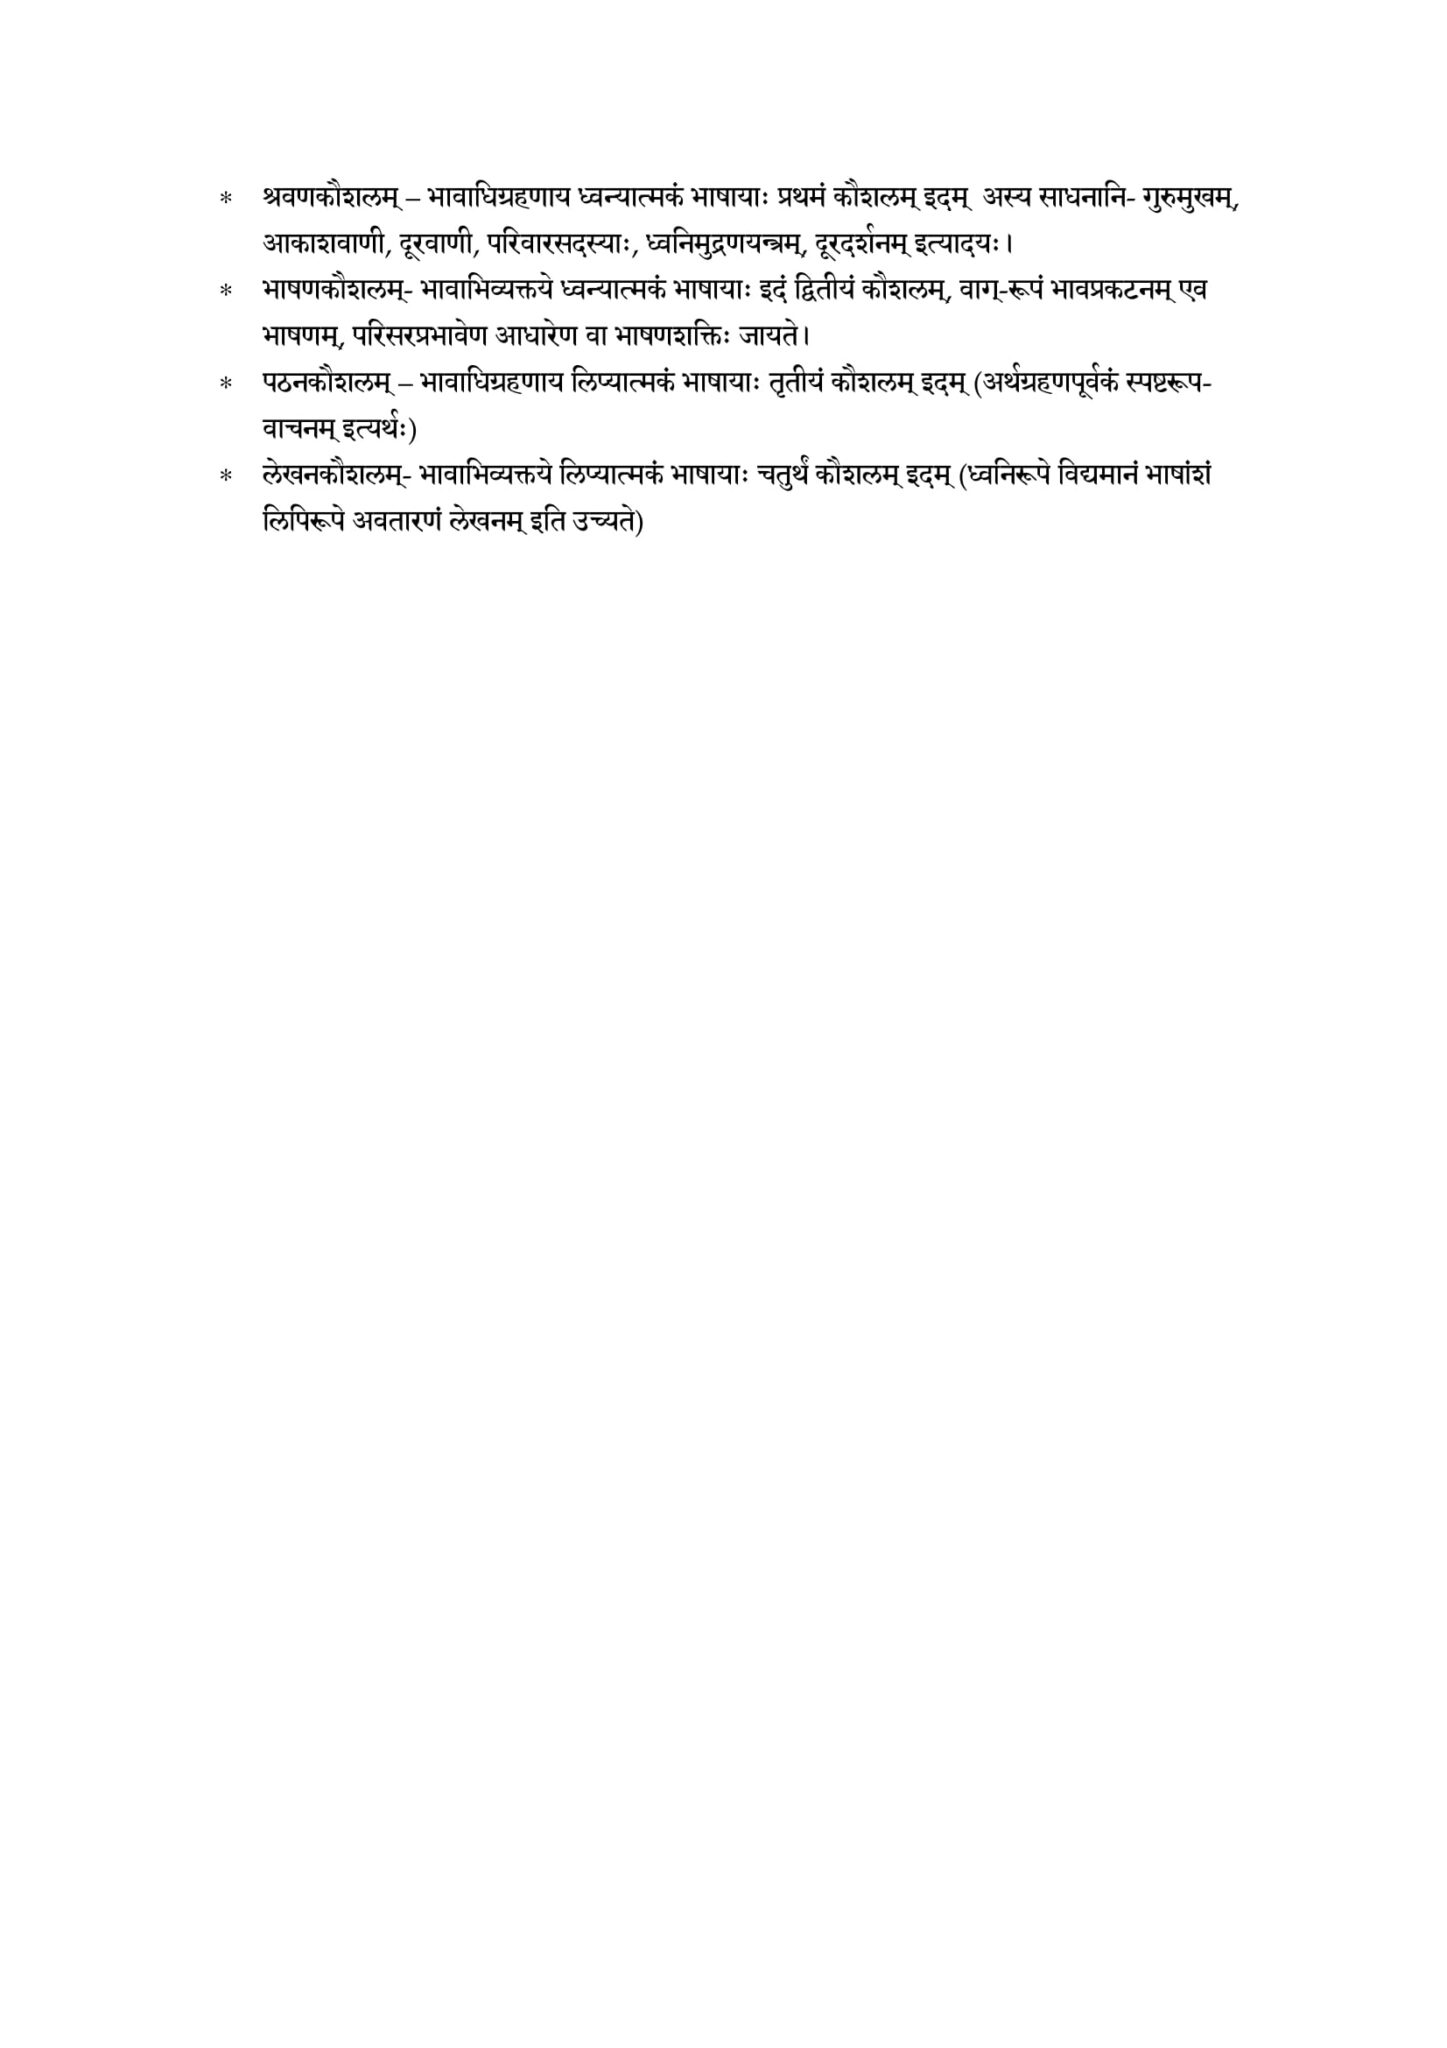 Sanskrit Sec 2020 21 class 9 10 03